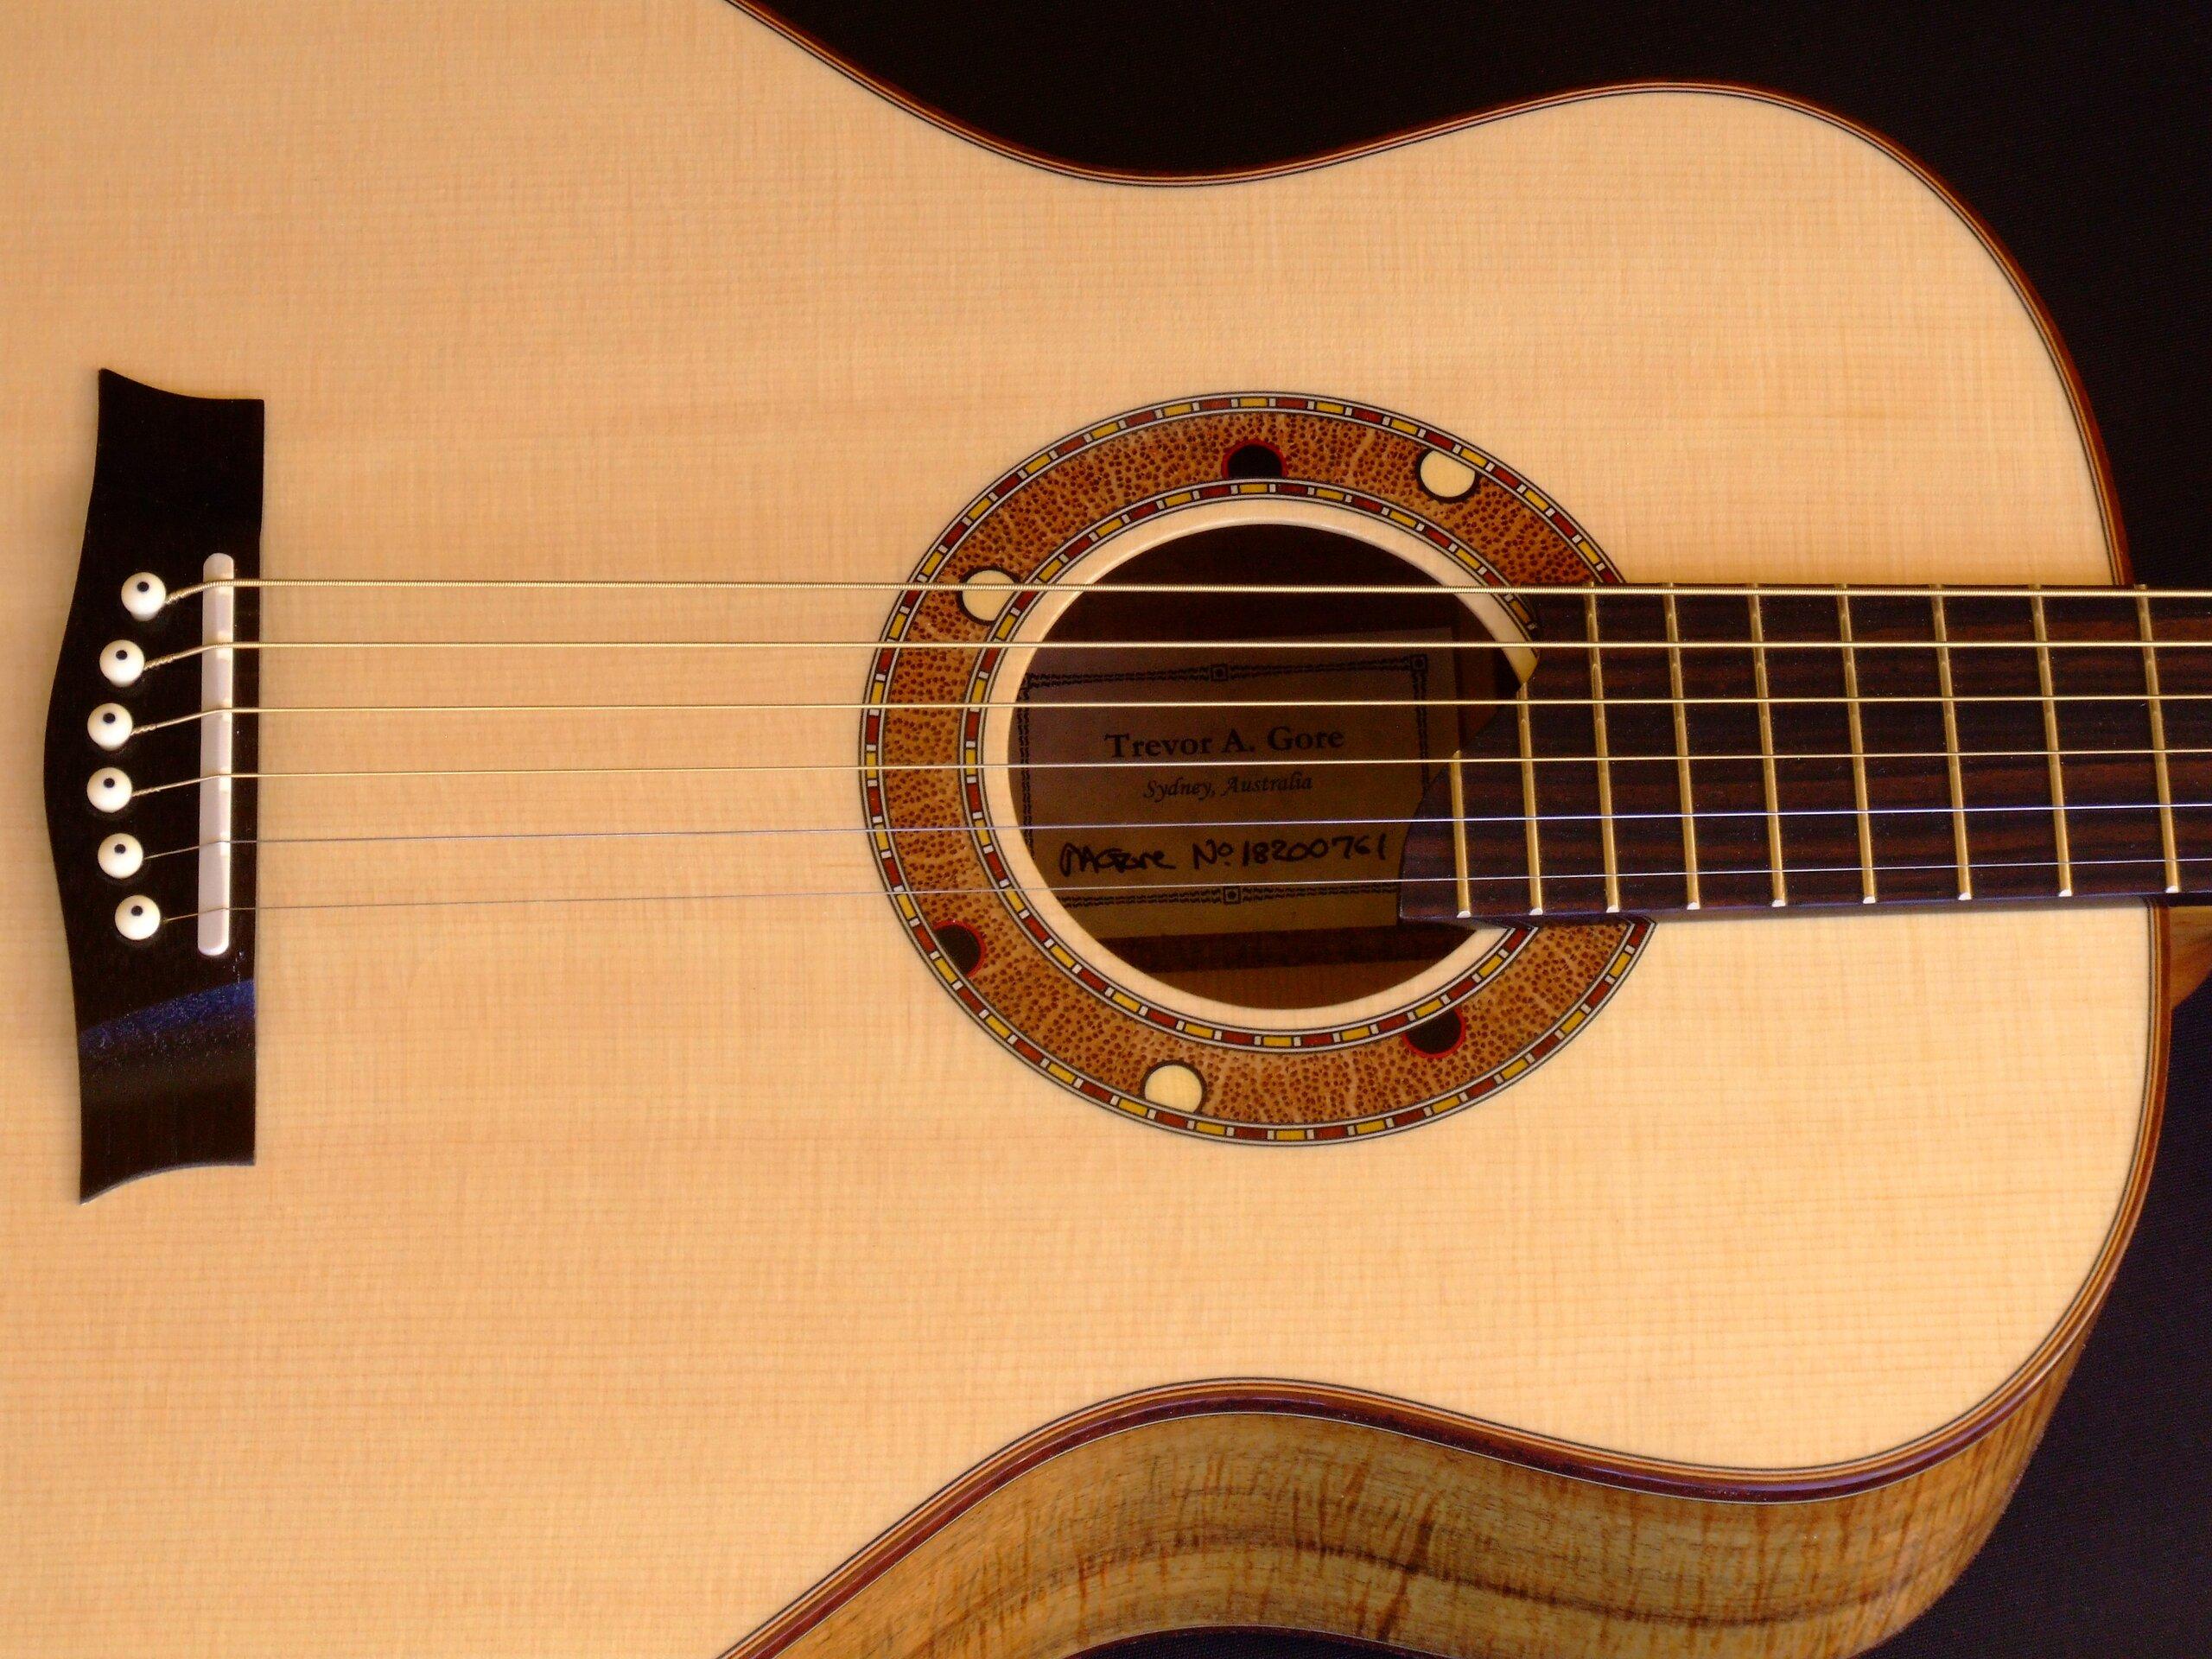 Australiana decoration on a medium retro guitar